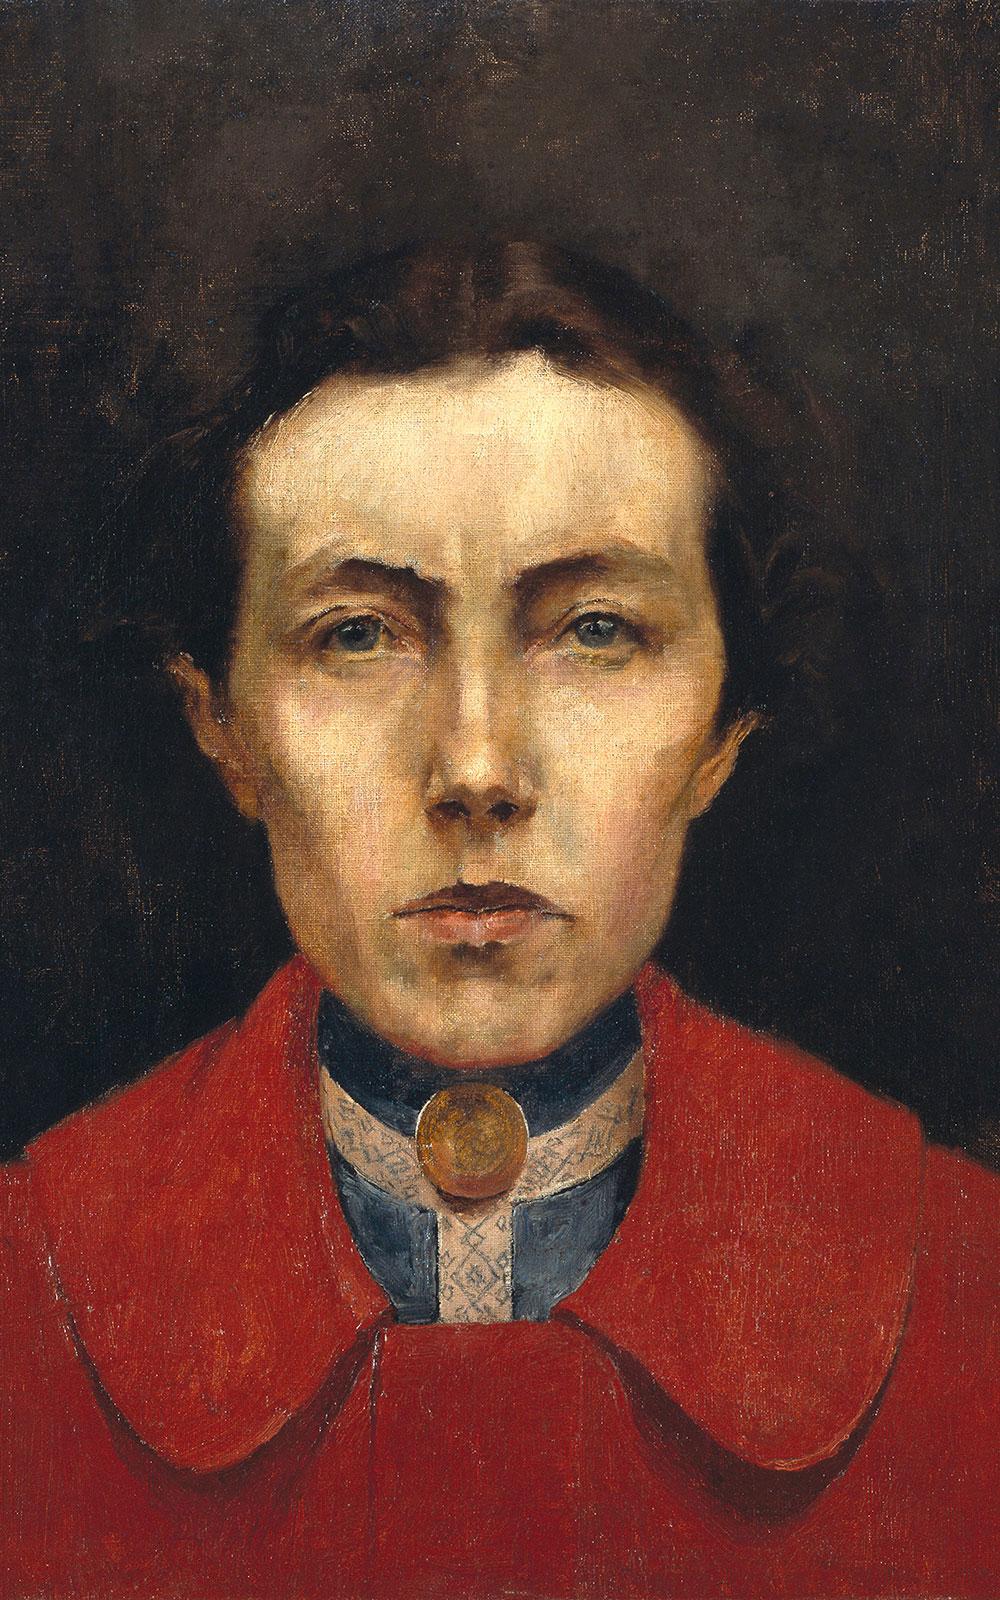 Aurélia de Souza (1866-1922), Autoretrato, 1900